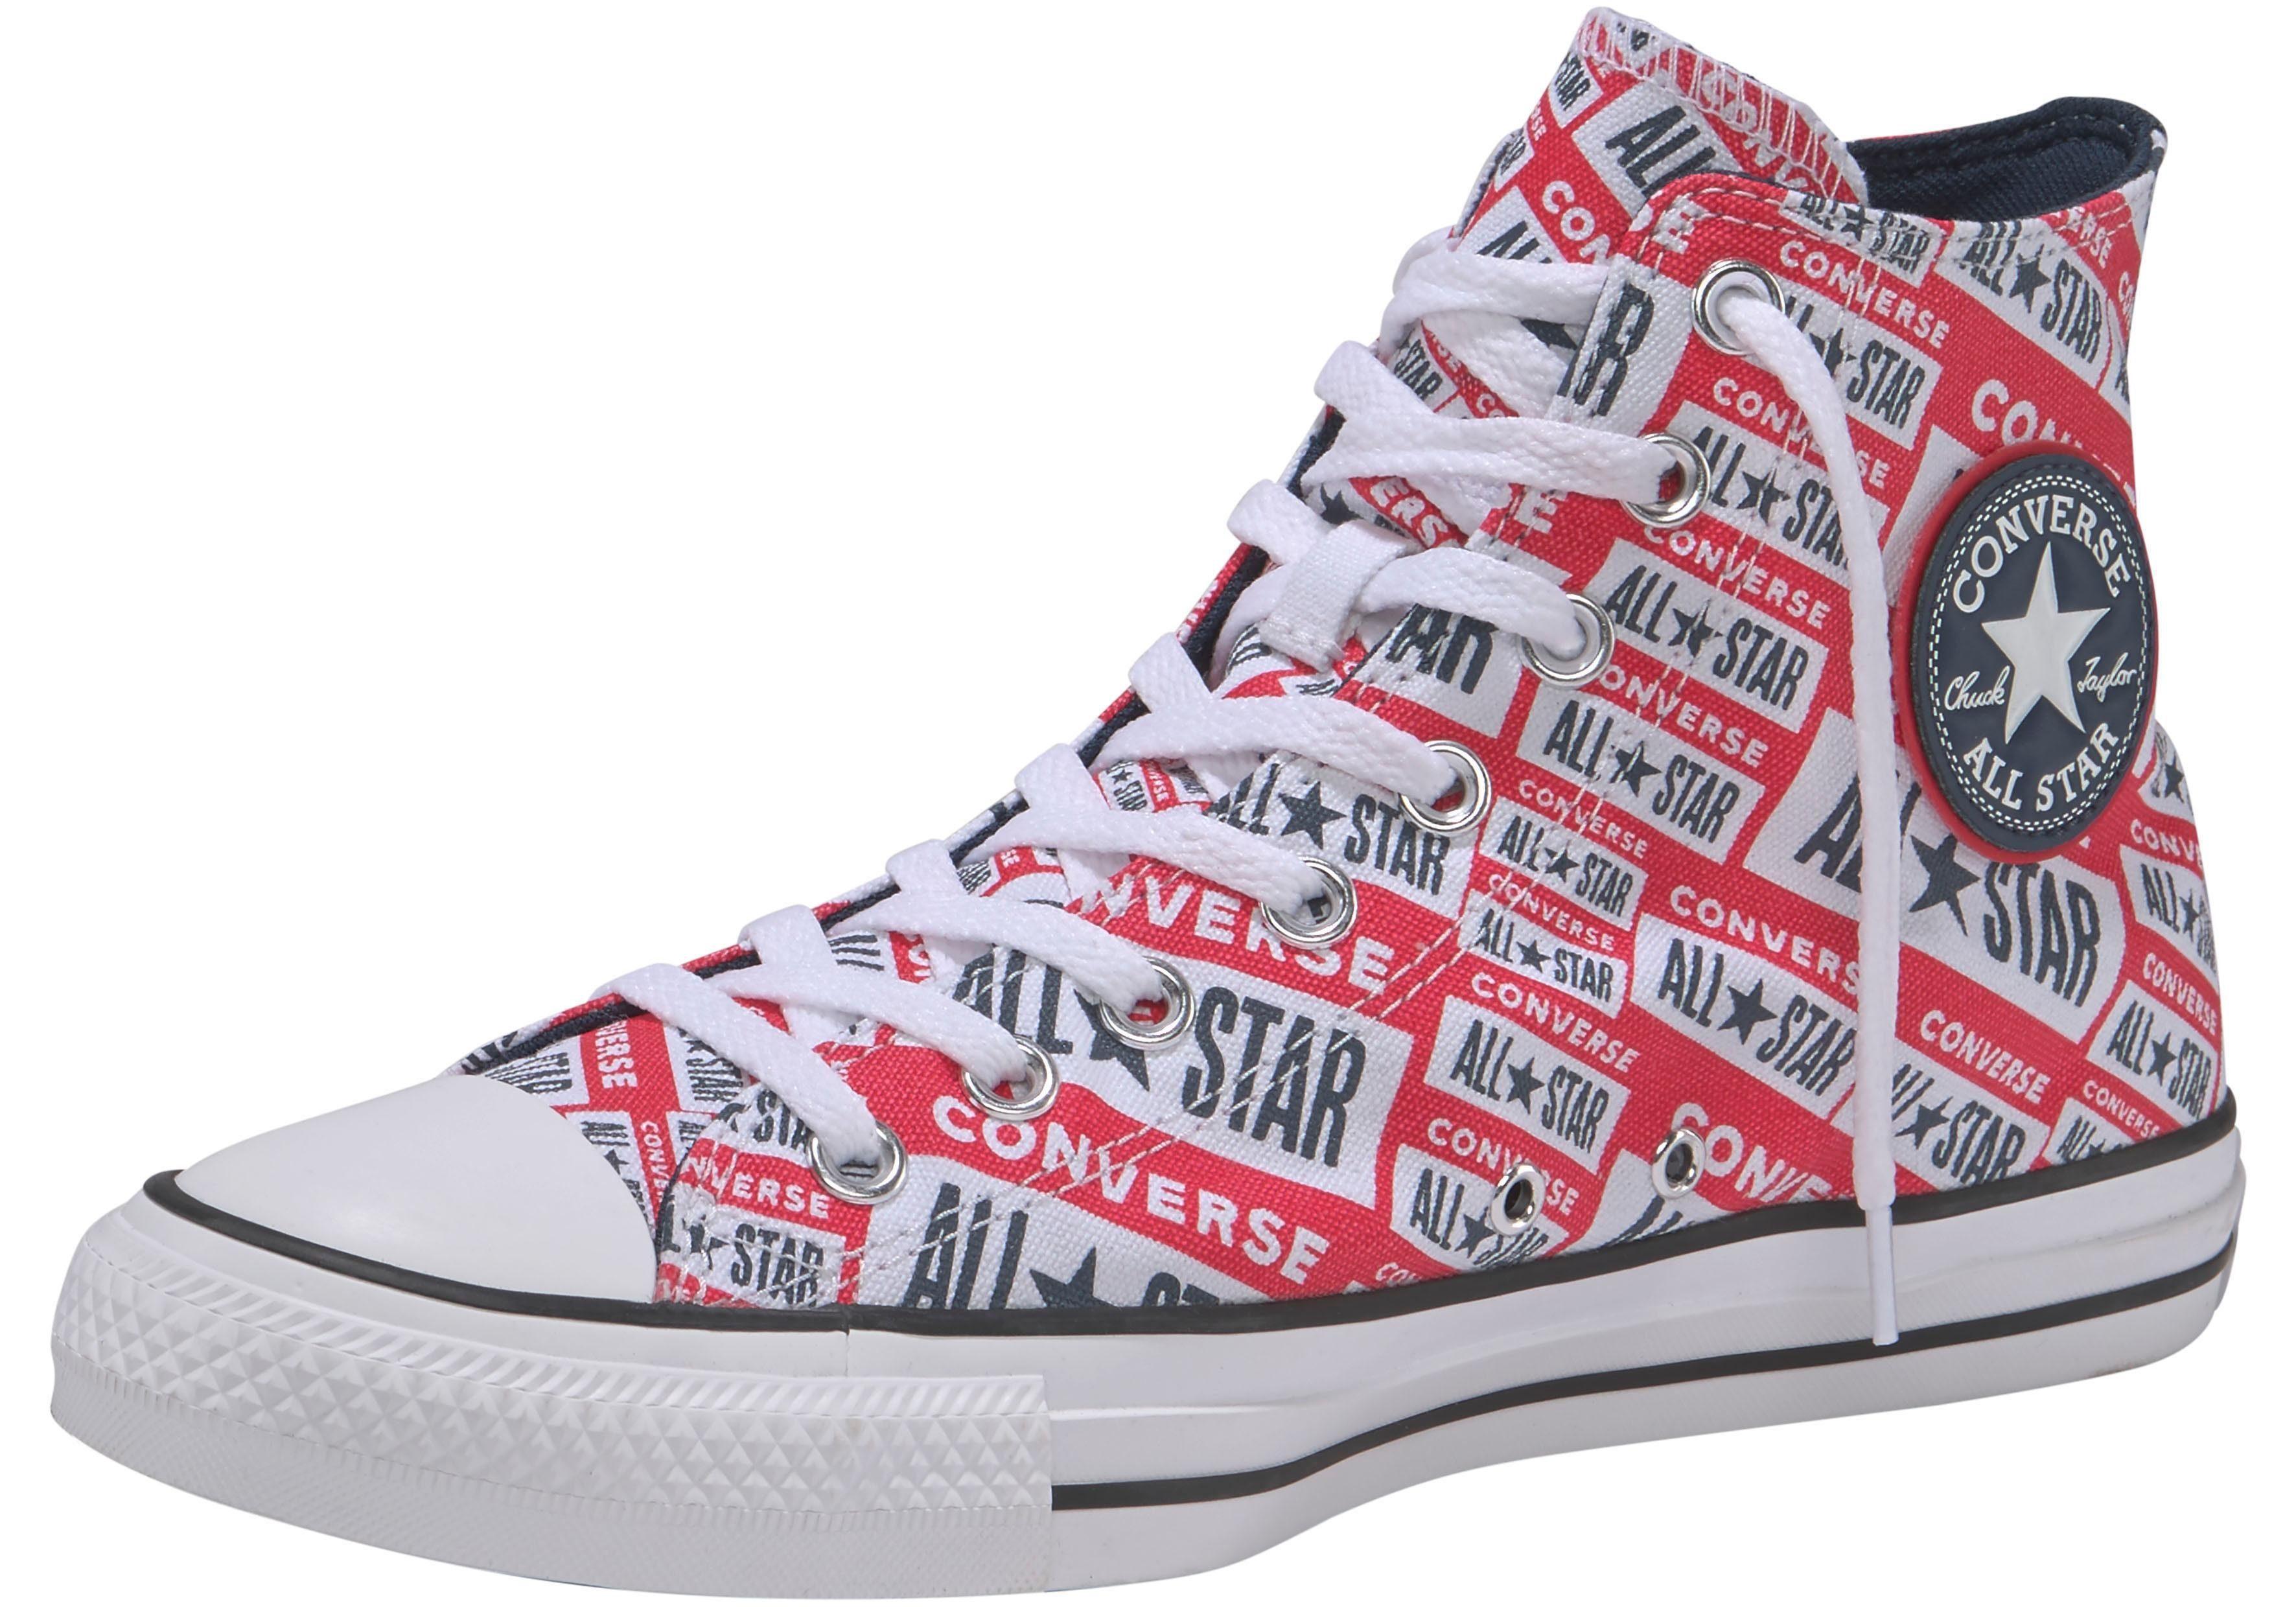 Converse »Chuck Taylor All Star Hi Seasonal« Sneaker online kaufen | OTTO